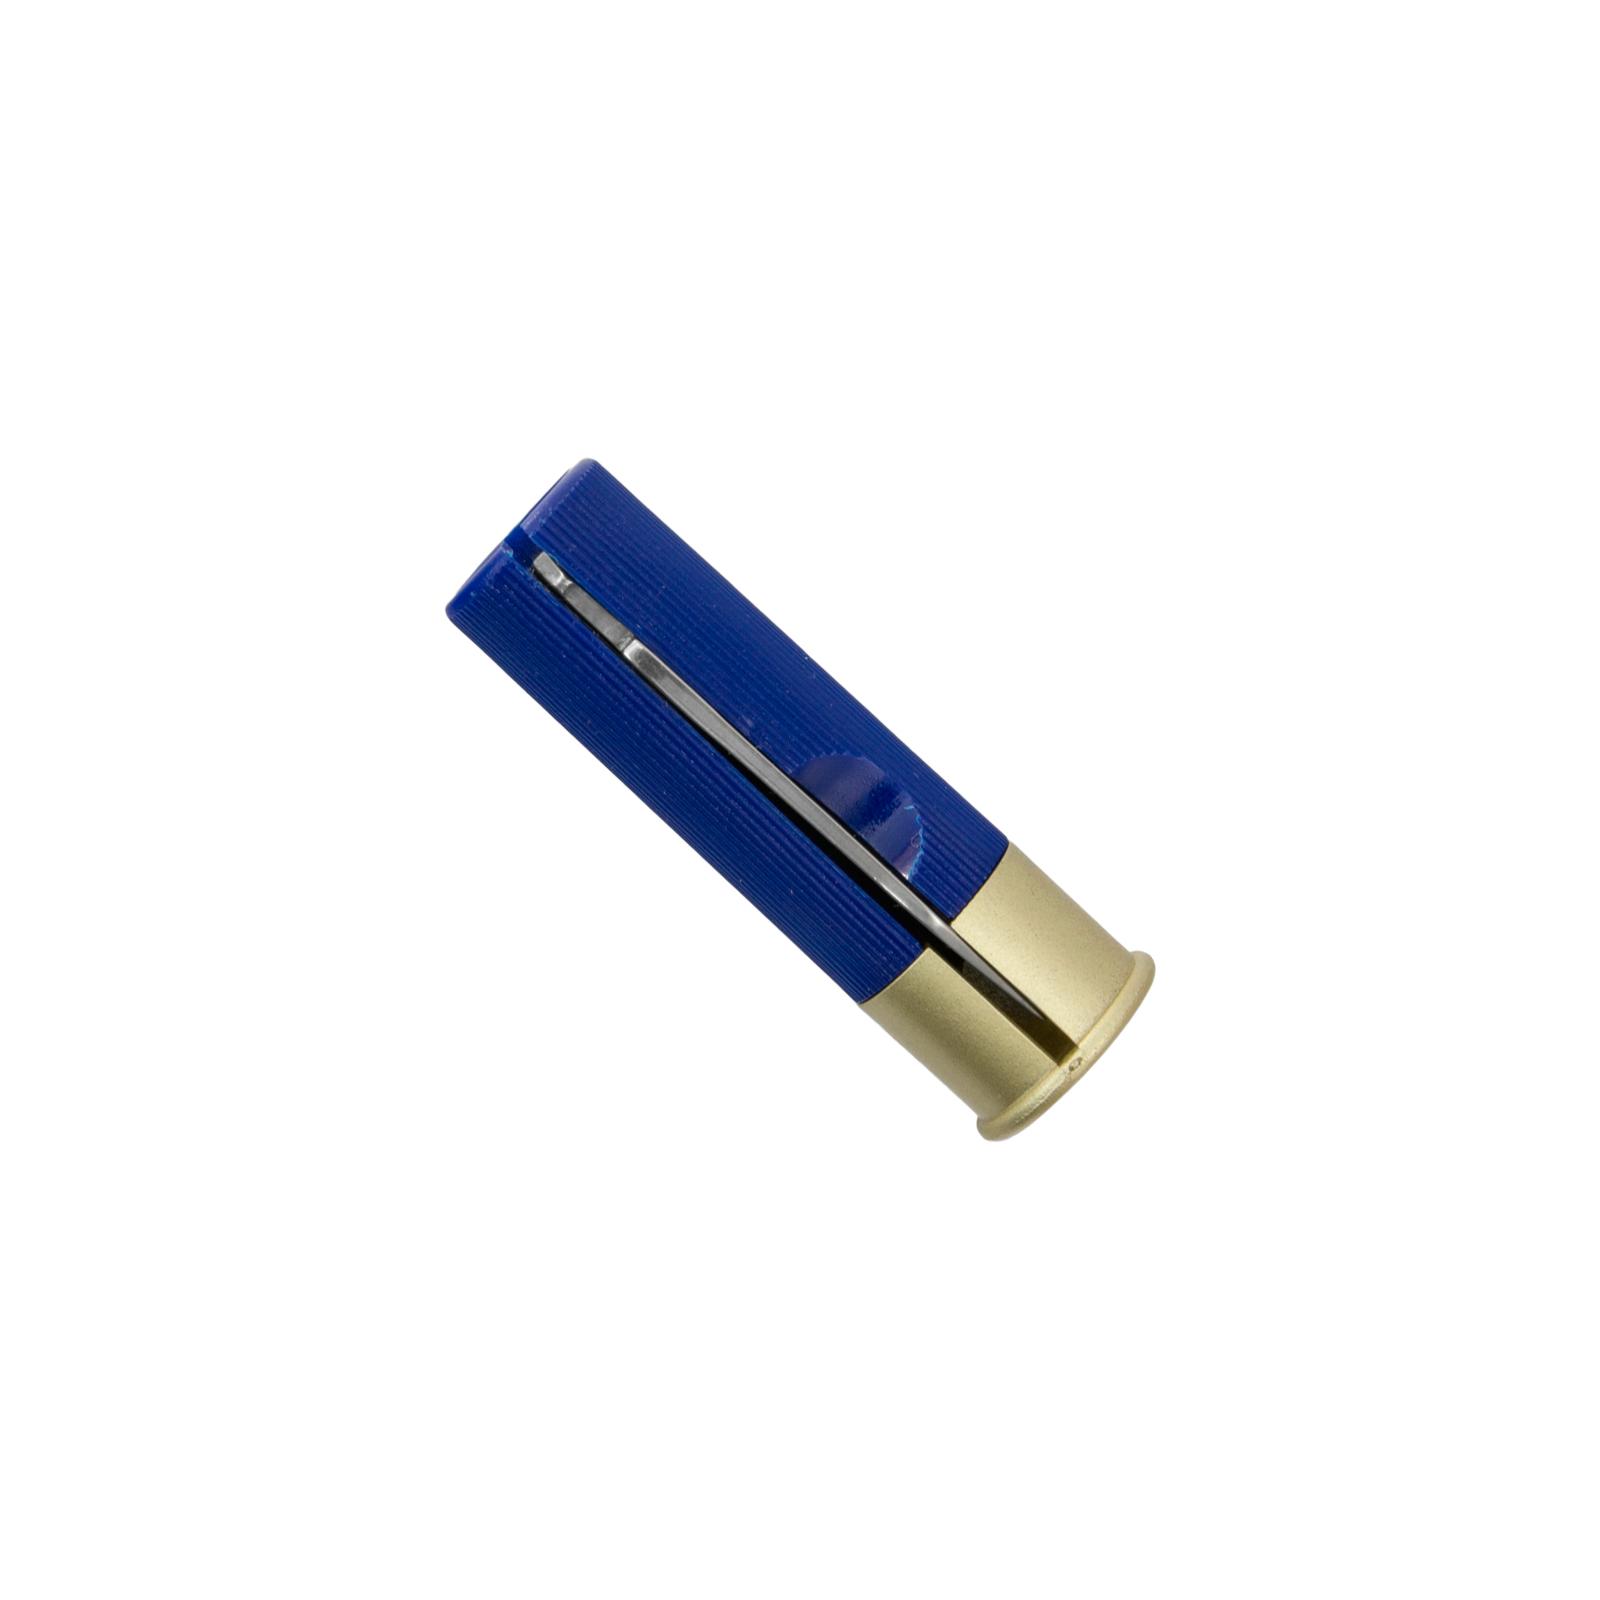 Нож Ganzo G624 синий (G624M-BL/G624S-BL) изображение 2